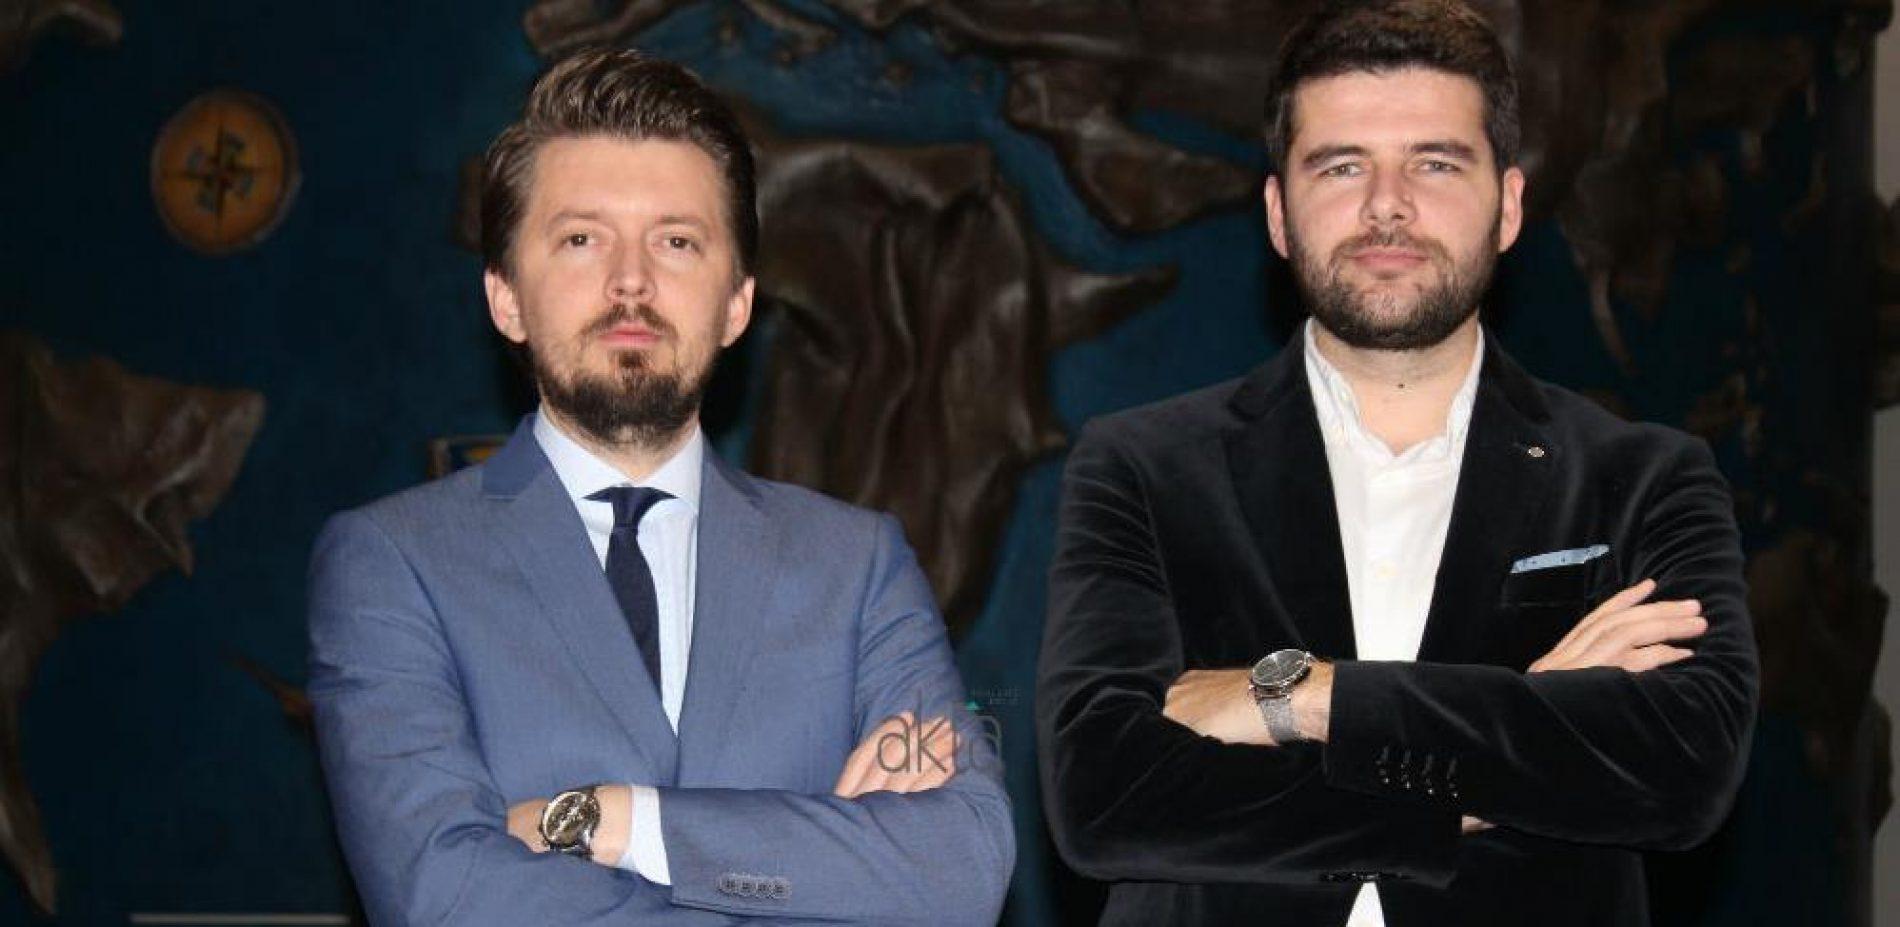 Edin i Samir vratili se iz Turske i pokrenuli biznis u Bosni i Hercegovini